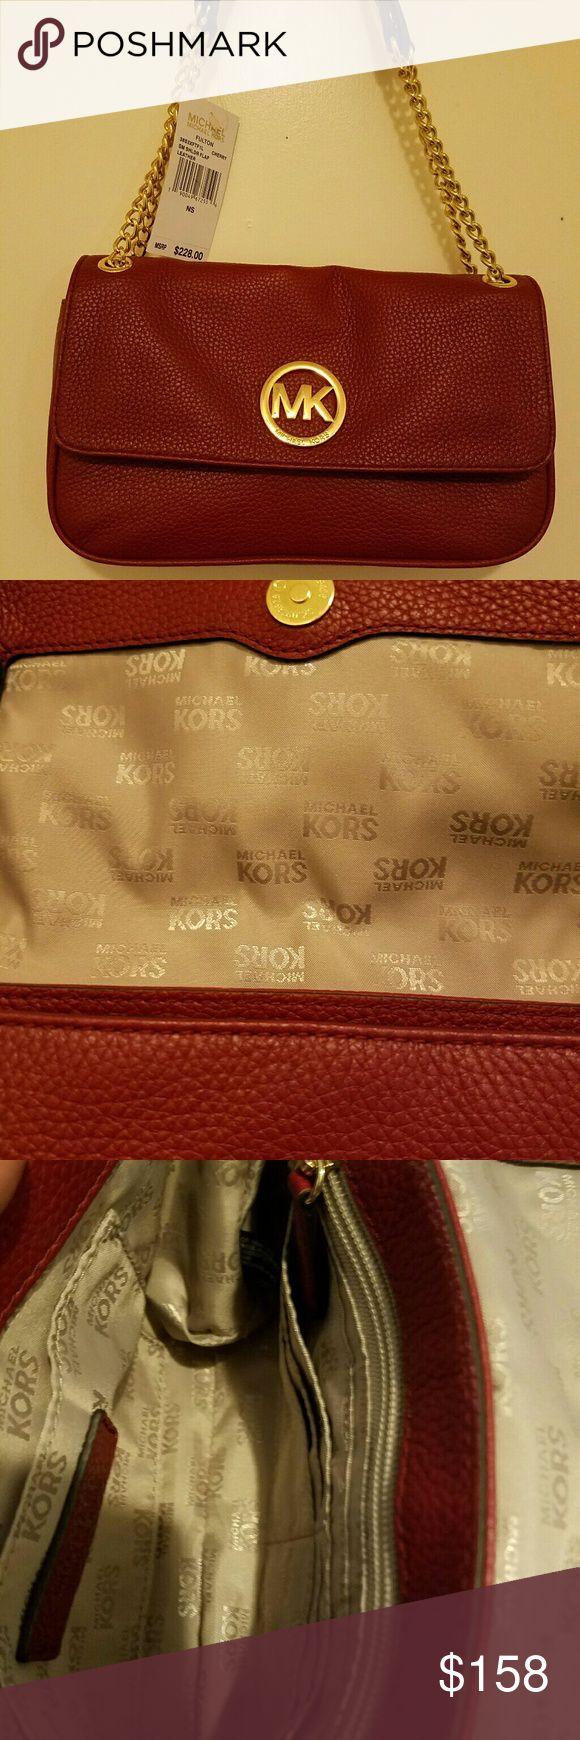 ???MICHAEL KORS SHOULDER BAG??? Fulton small shoulder flap leather bag perfect for valentine's day Michael Kors Bags Shoulder Bags